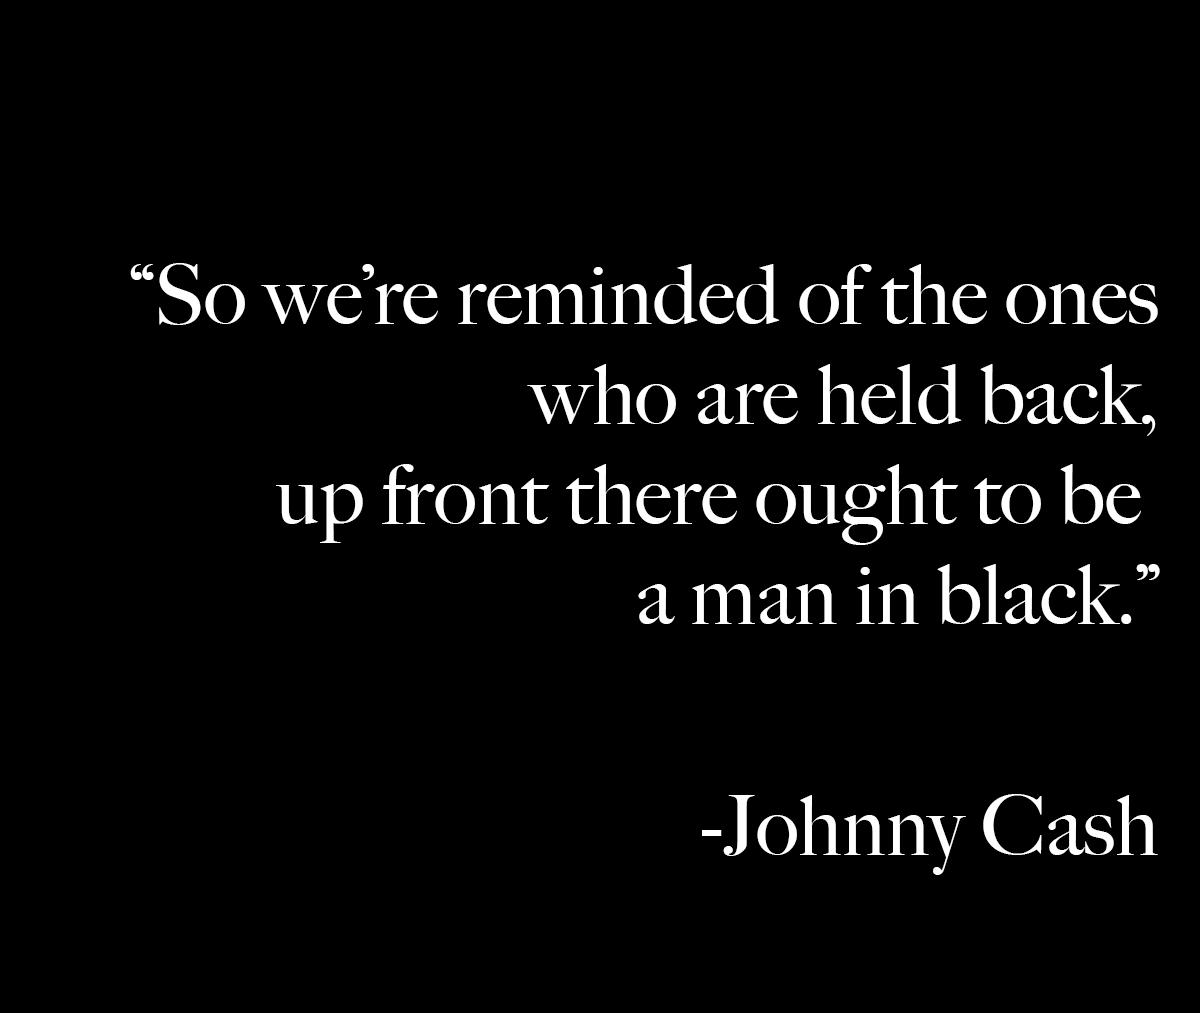 Johnny Cash - Man In Black lyrics